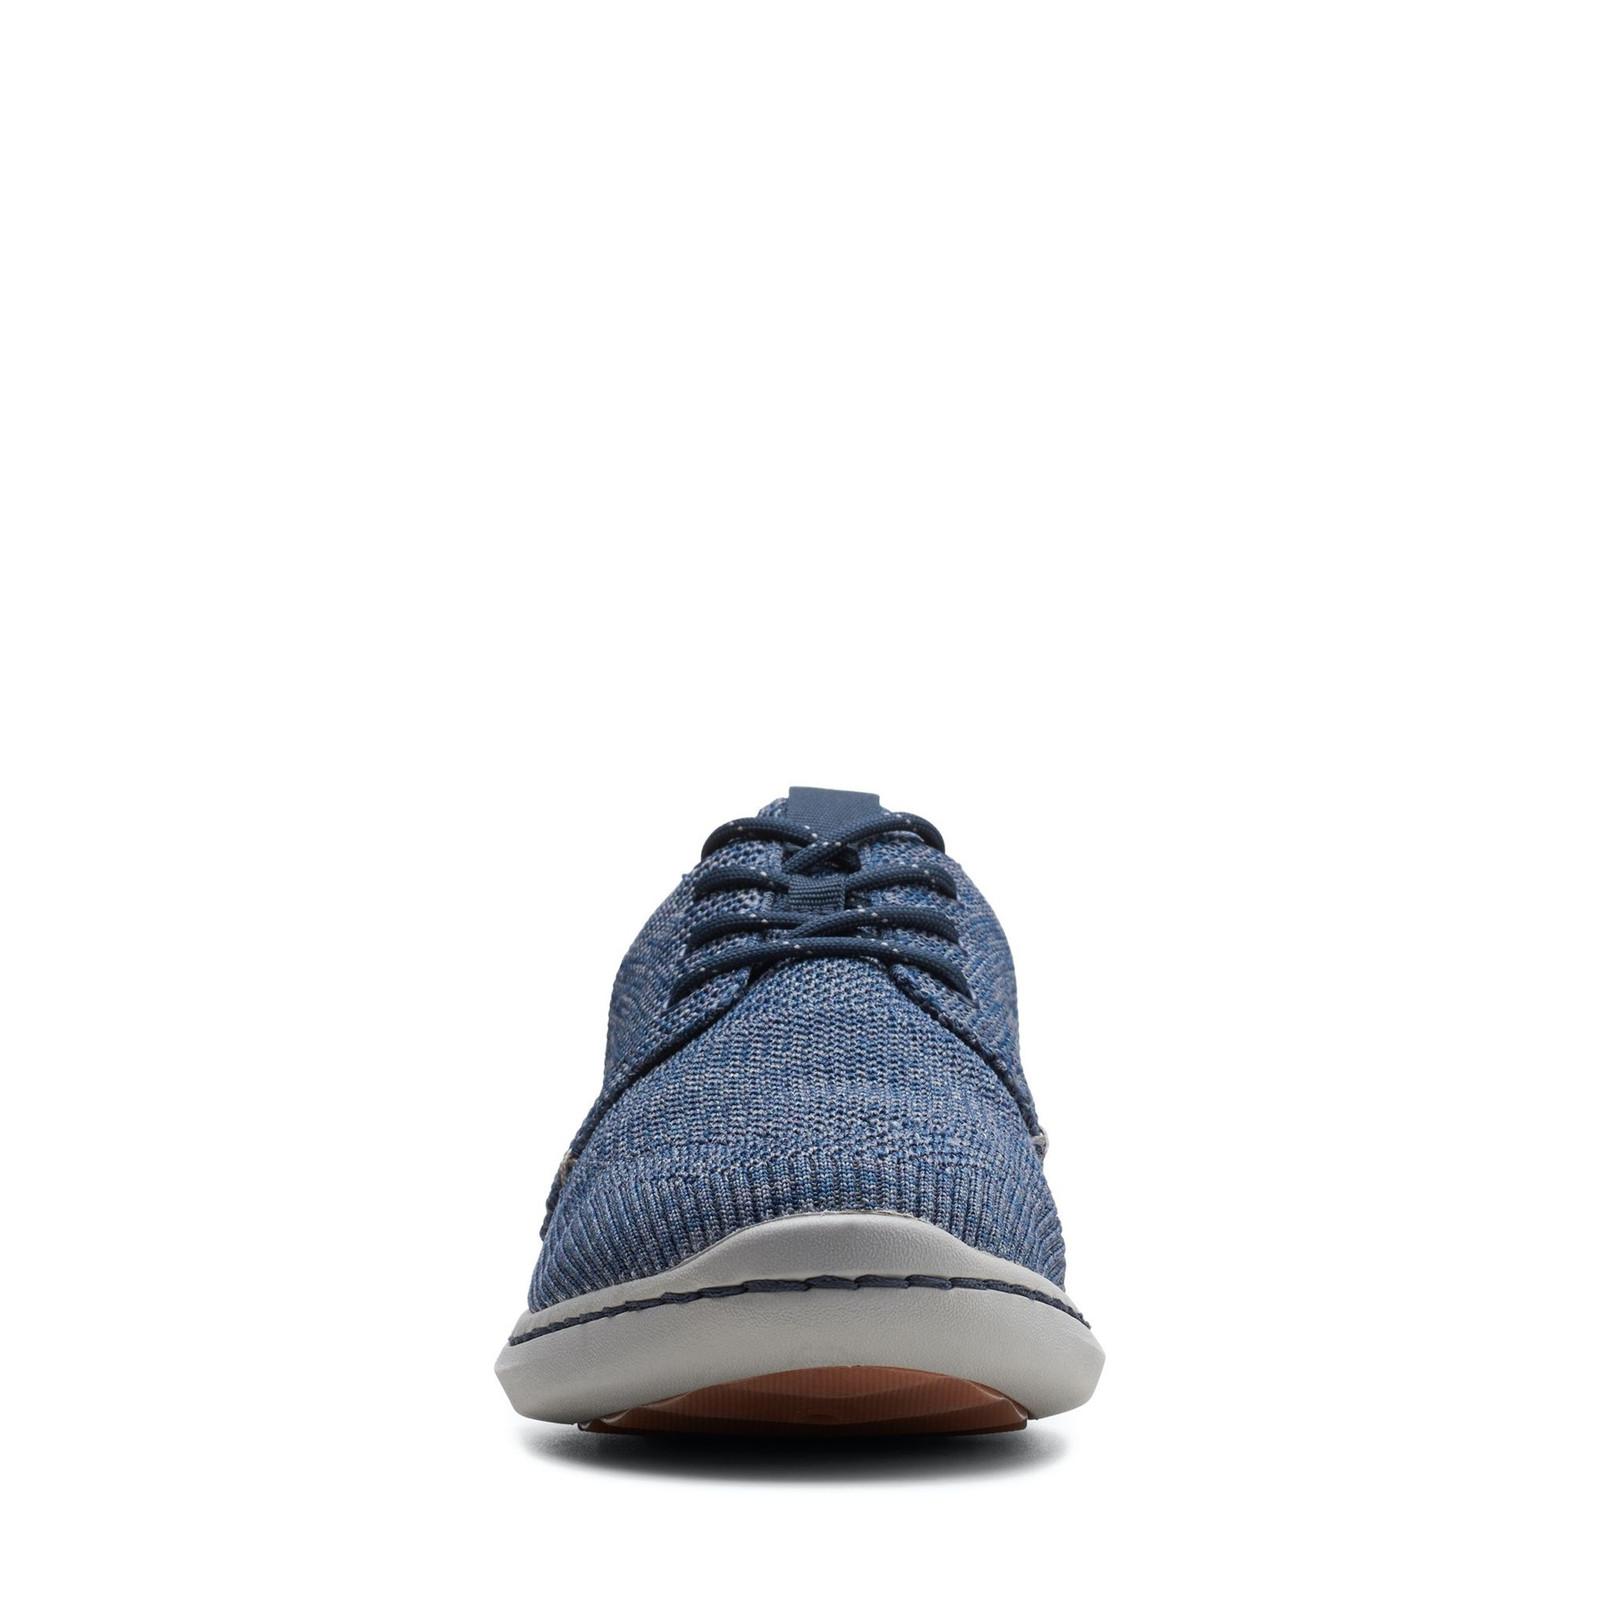 Clarks Mens STEP URBAN MIX Dark Blue Combi